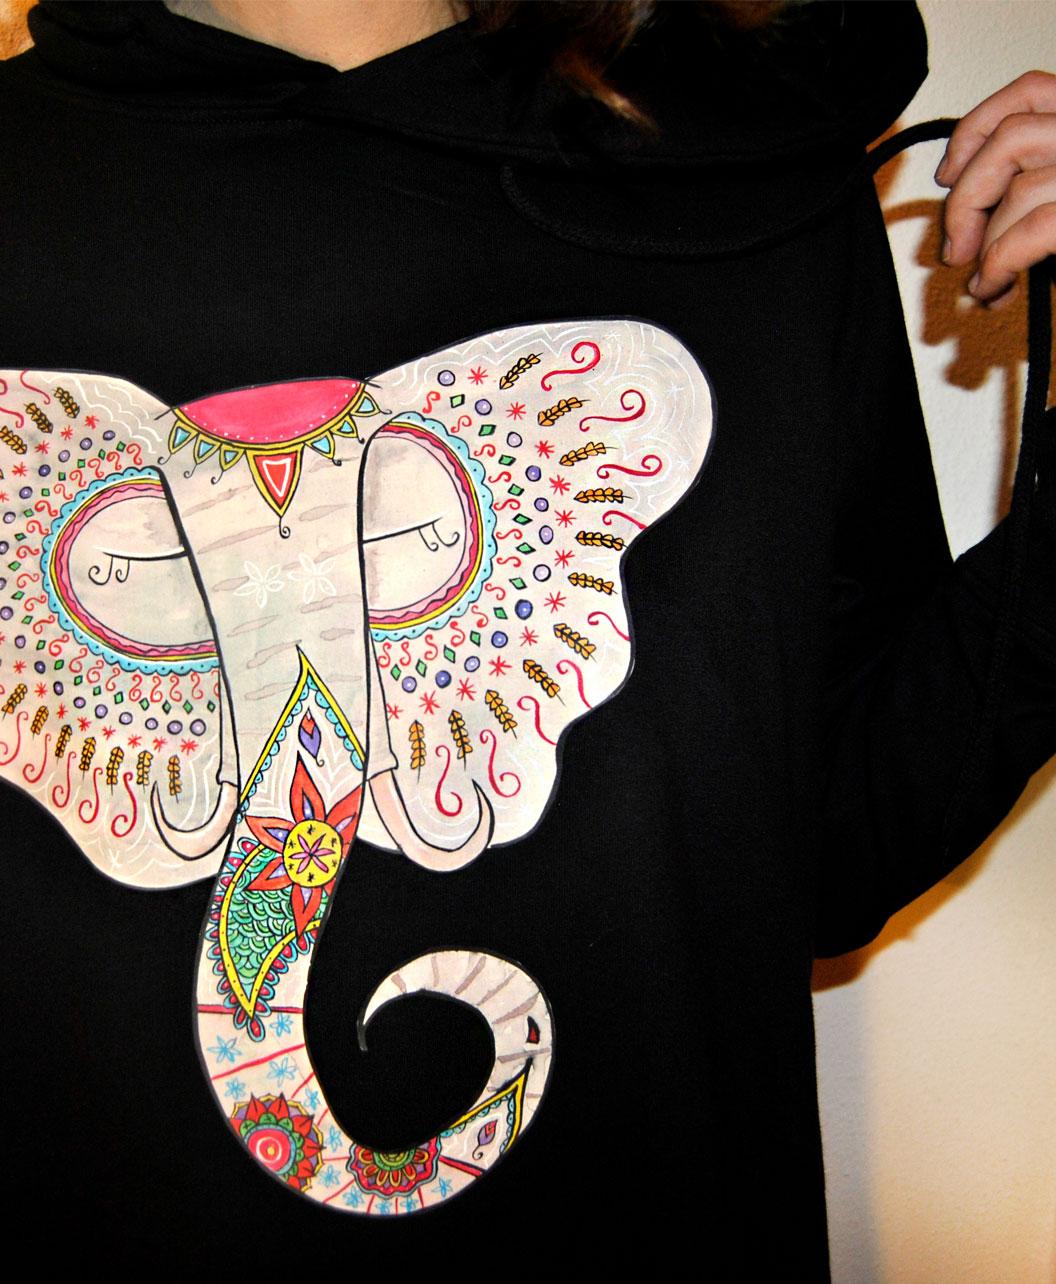 vestido sudadera capucha algodon organico mujer estilo alternativo diferente original dibujo elefante indio